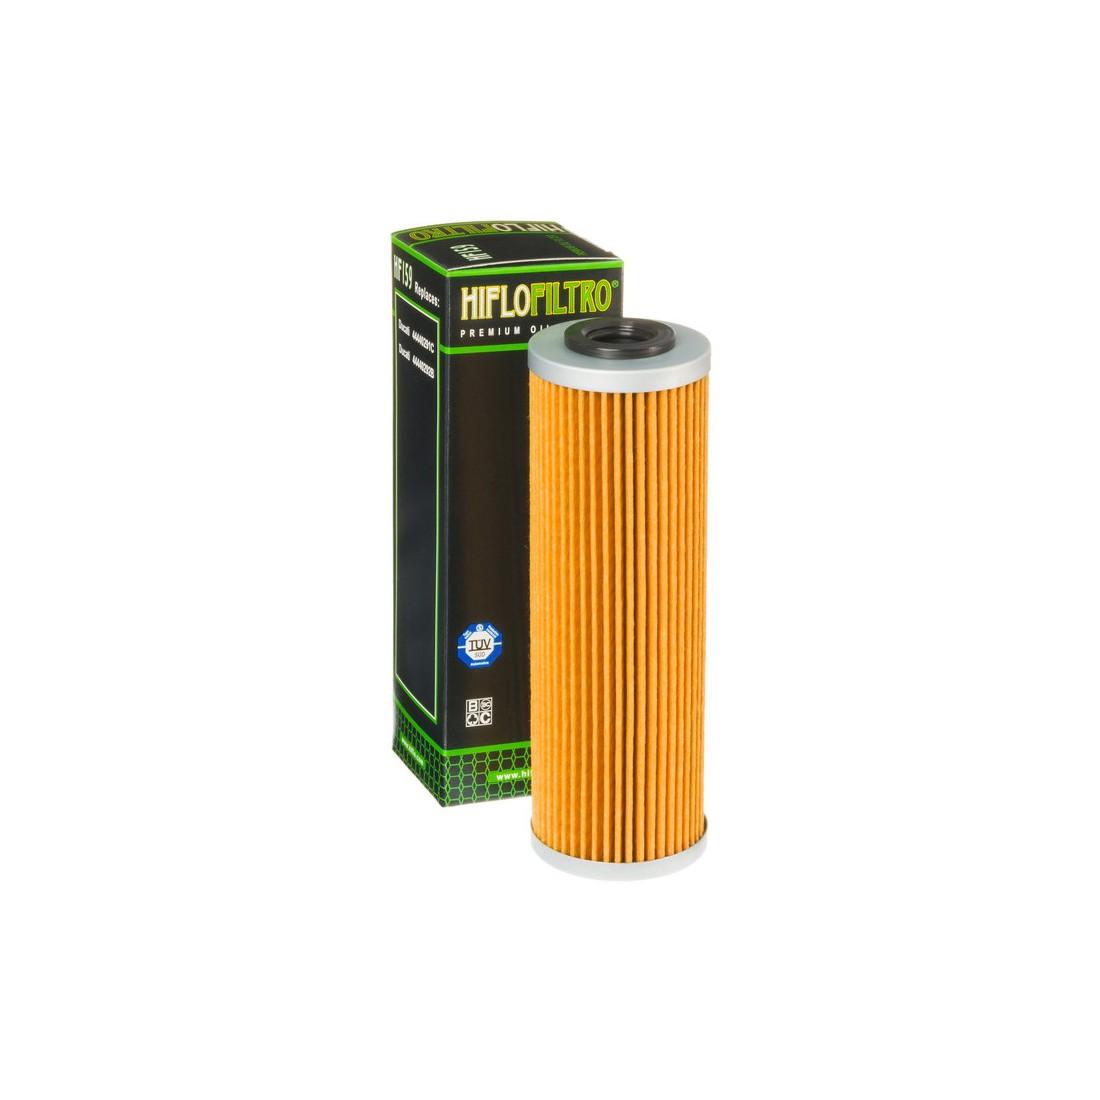 Filtro Aceite Hiflofiltro HF159